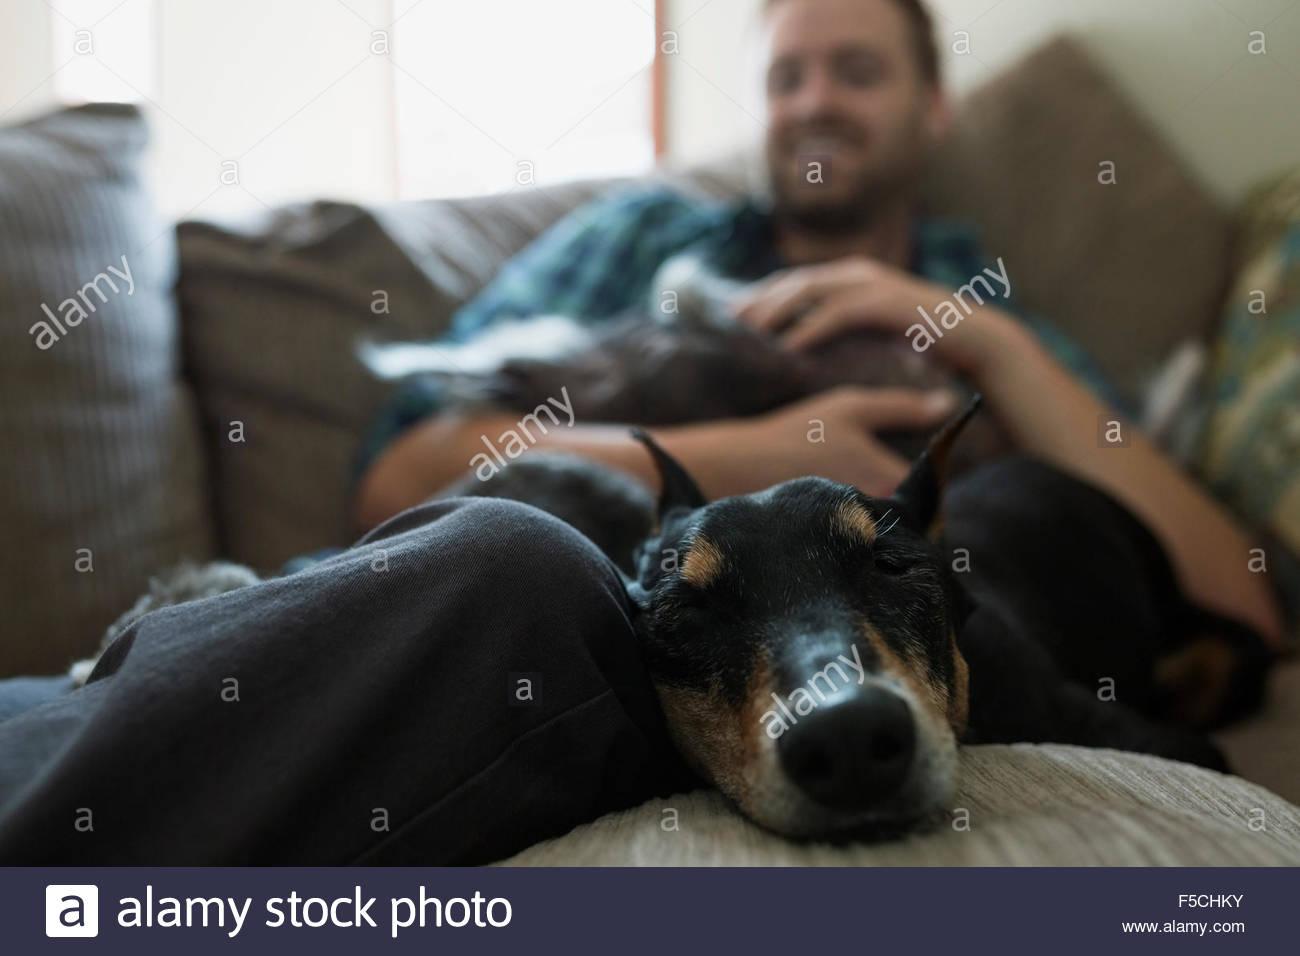 Sleeping dog with man on sofa - Stock Image